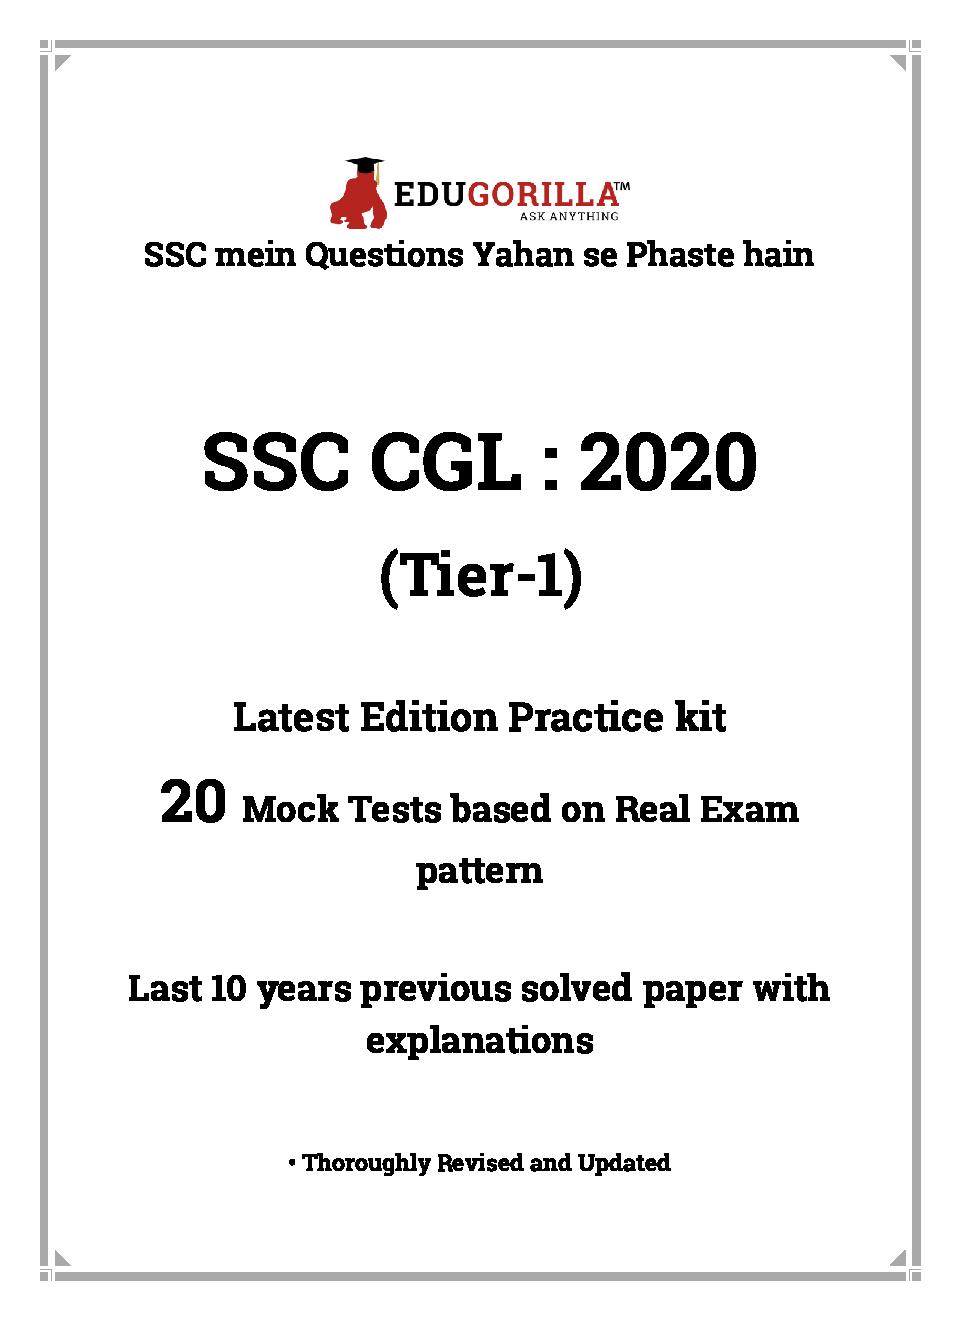 EduGorilla SSC CGL: 2020 Tier-I (Practice Kit) - Page 3